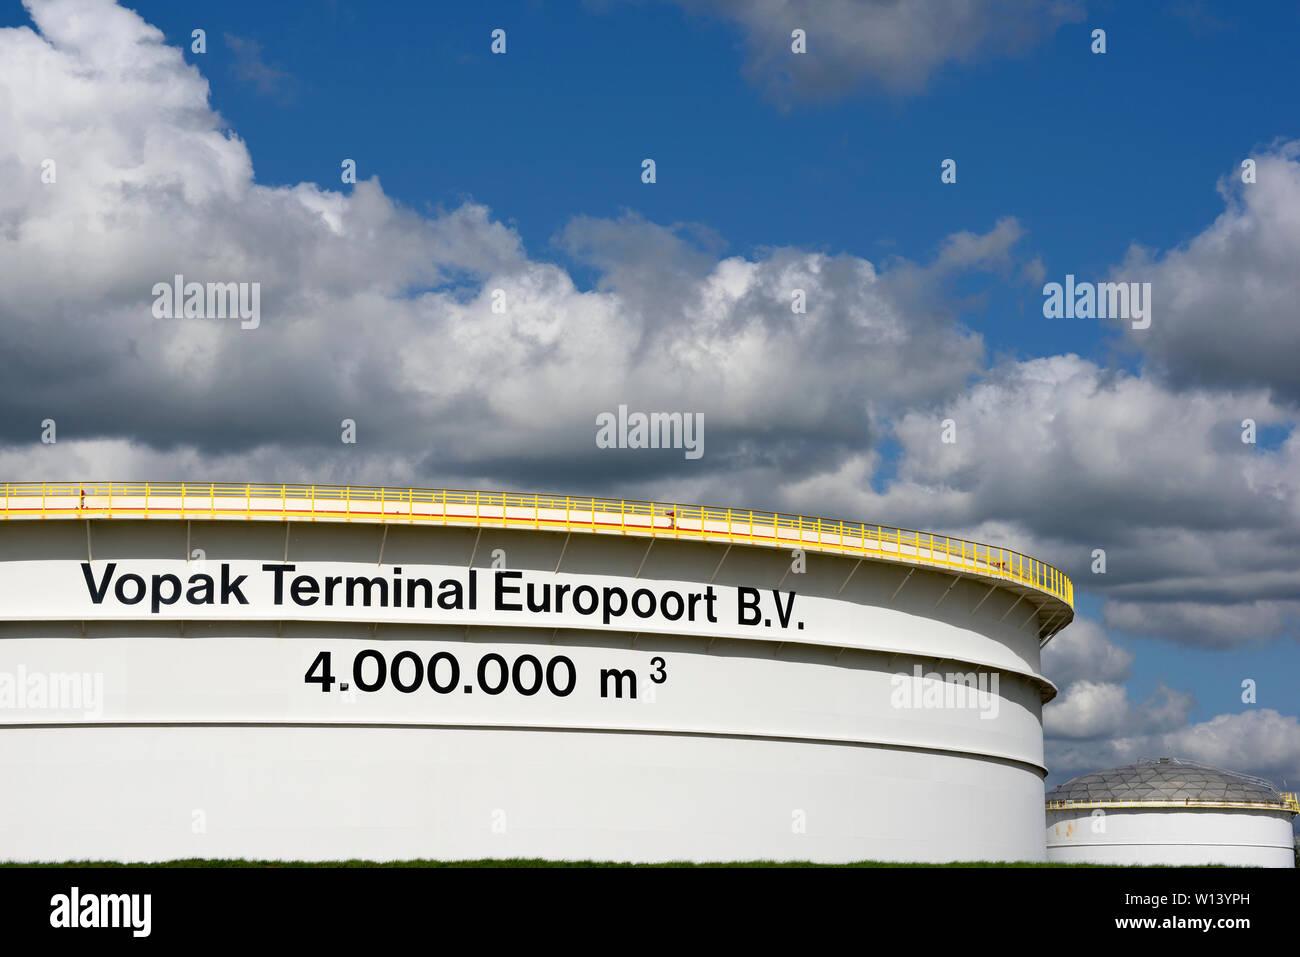 port of rotterdam, zuid holland/netherlands - september 07, 2018: vopak crude oil / petroleum products tanks in europoort Stock Photo